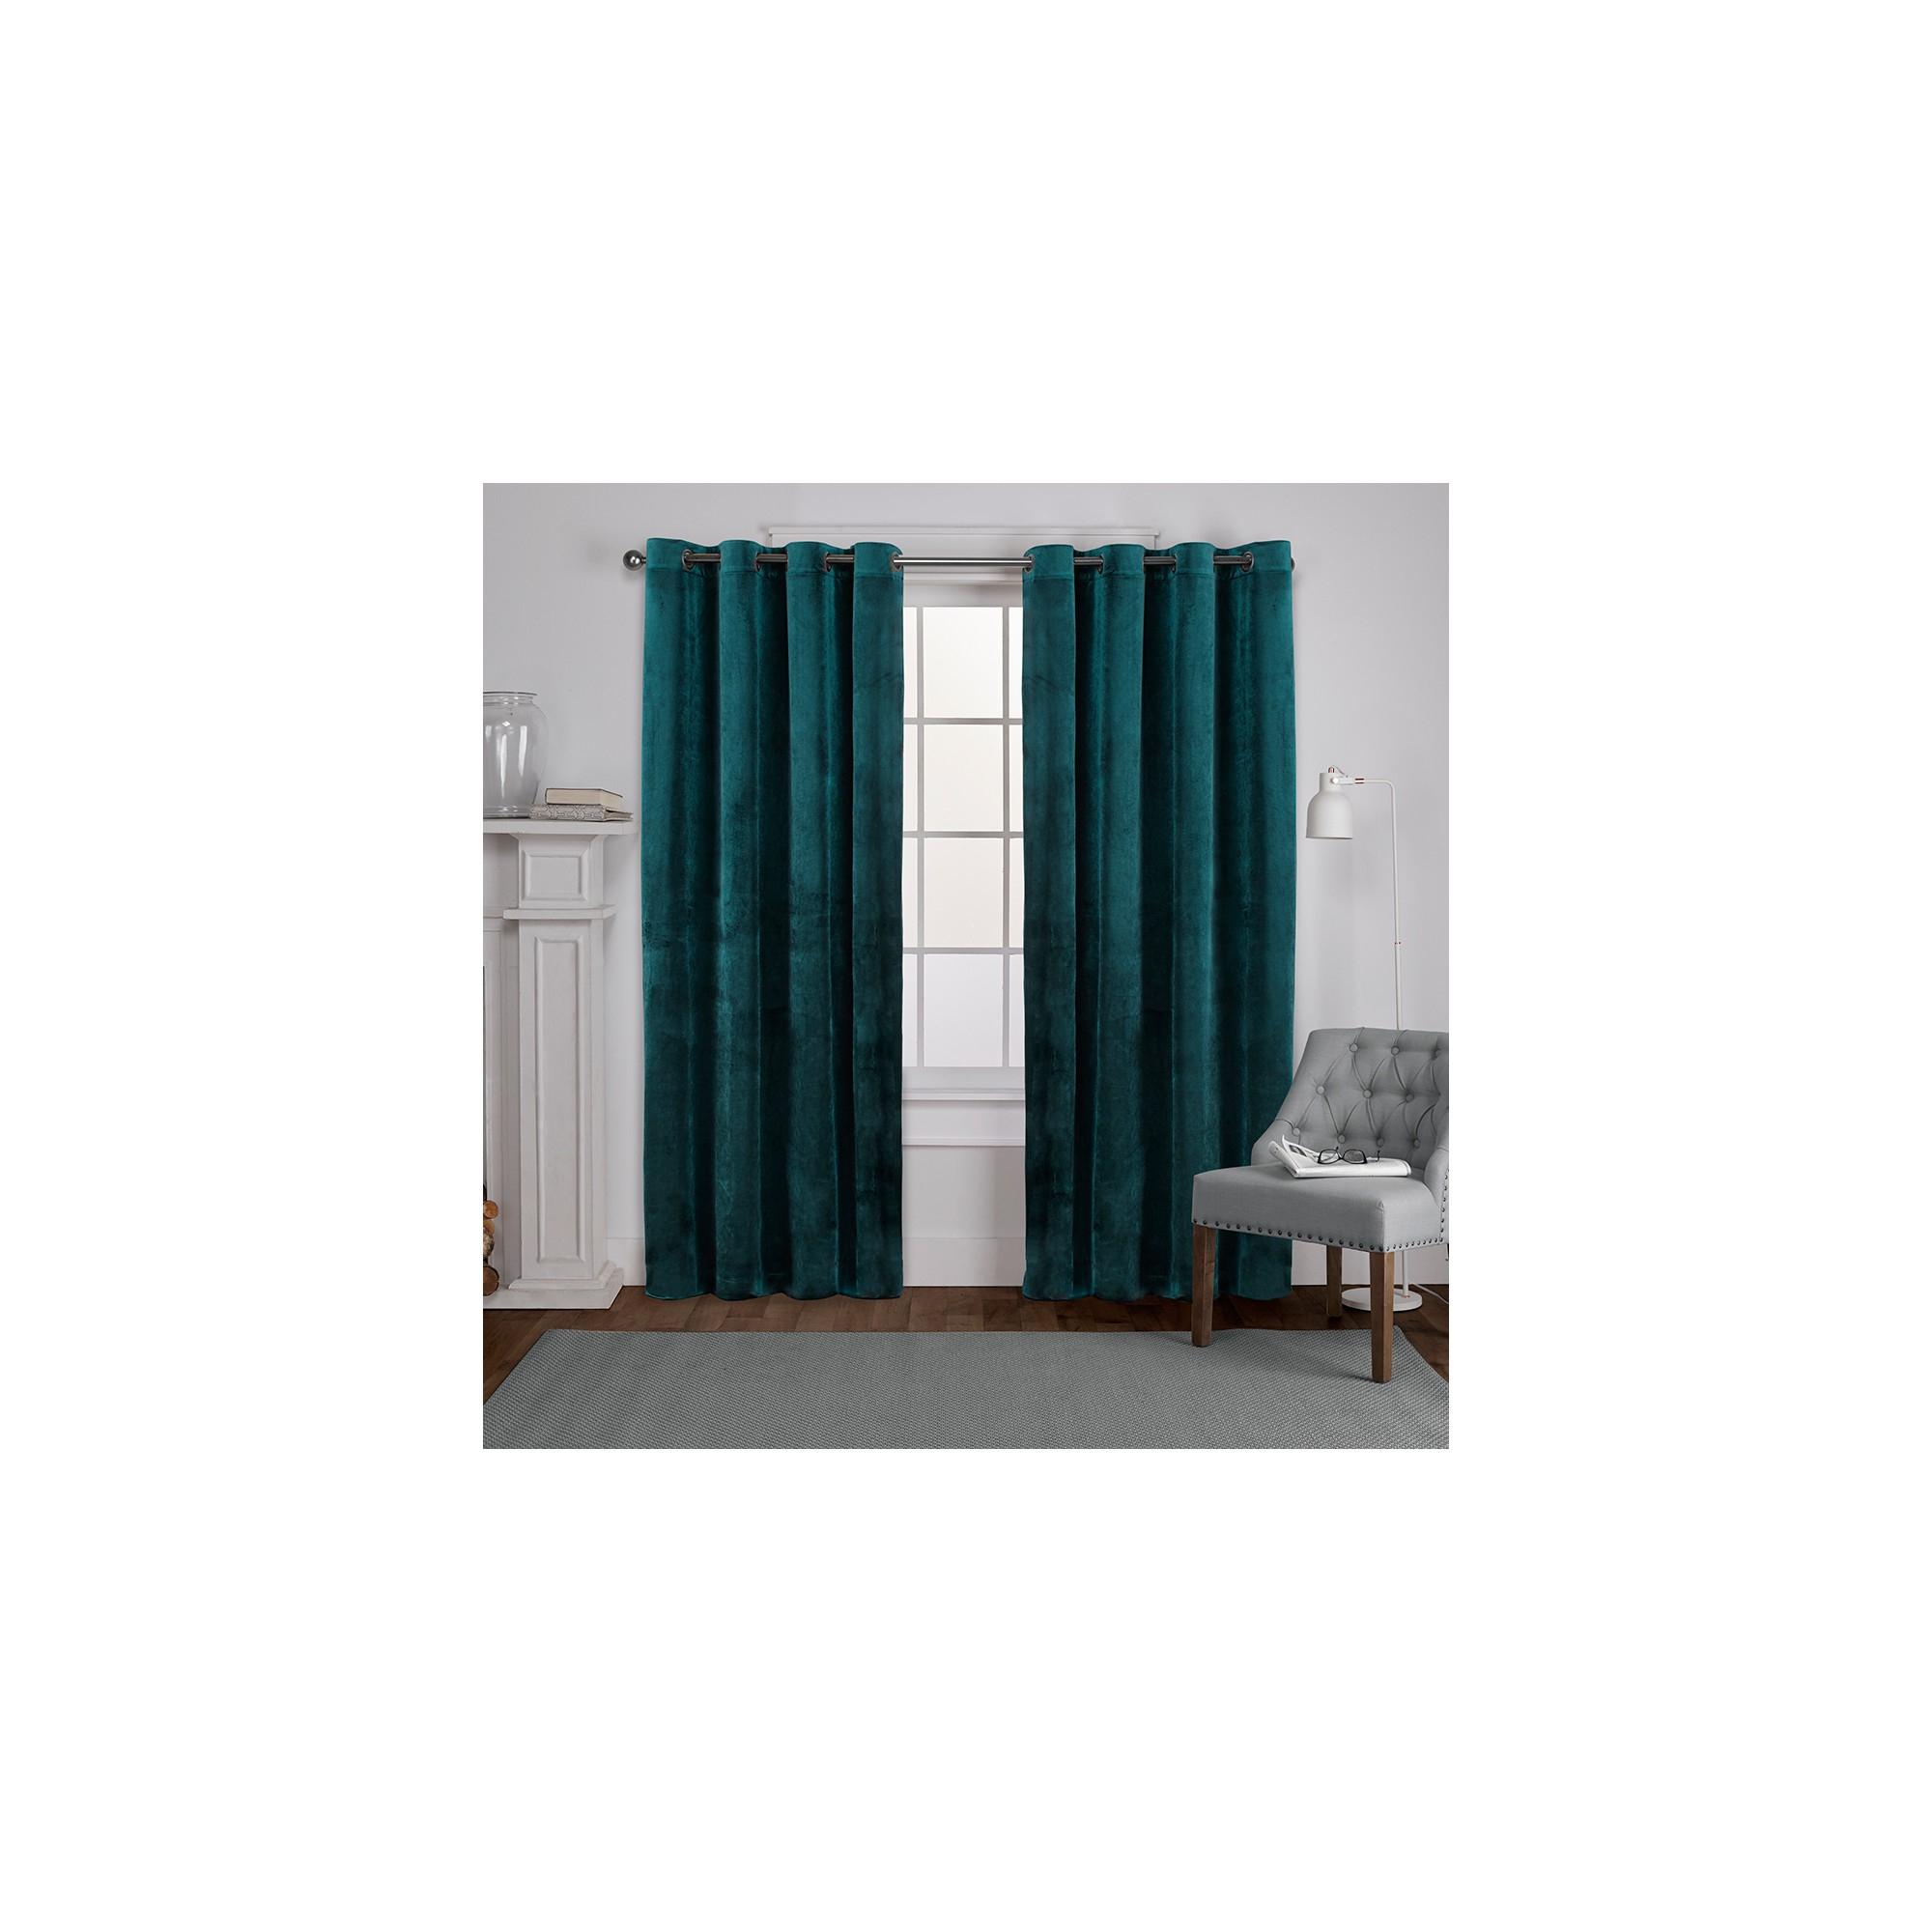 2021 Velvet Heavyweight Grommet Top Curtain Panel Pairs Inside Velvet Heavyweight Grommet Top Window Curtain Panel Pair (View 10 of 20)